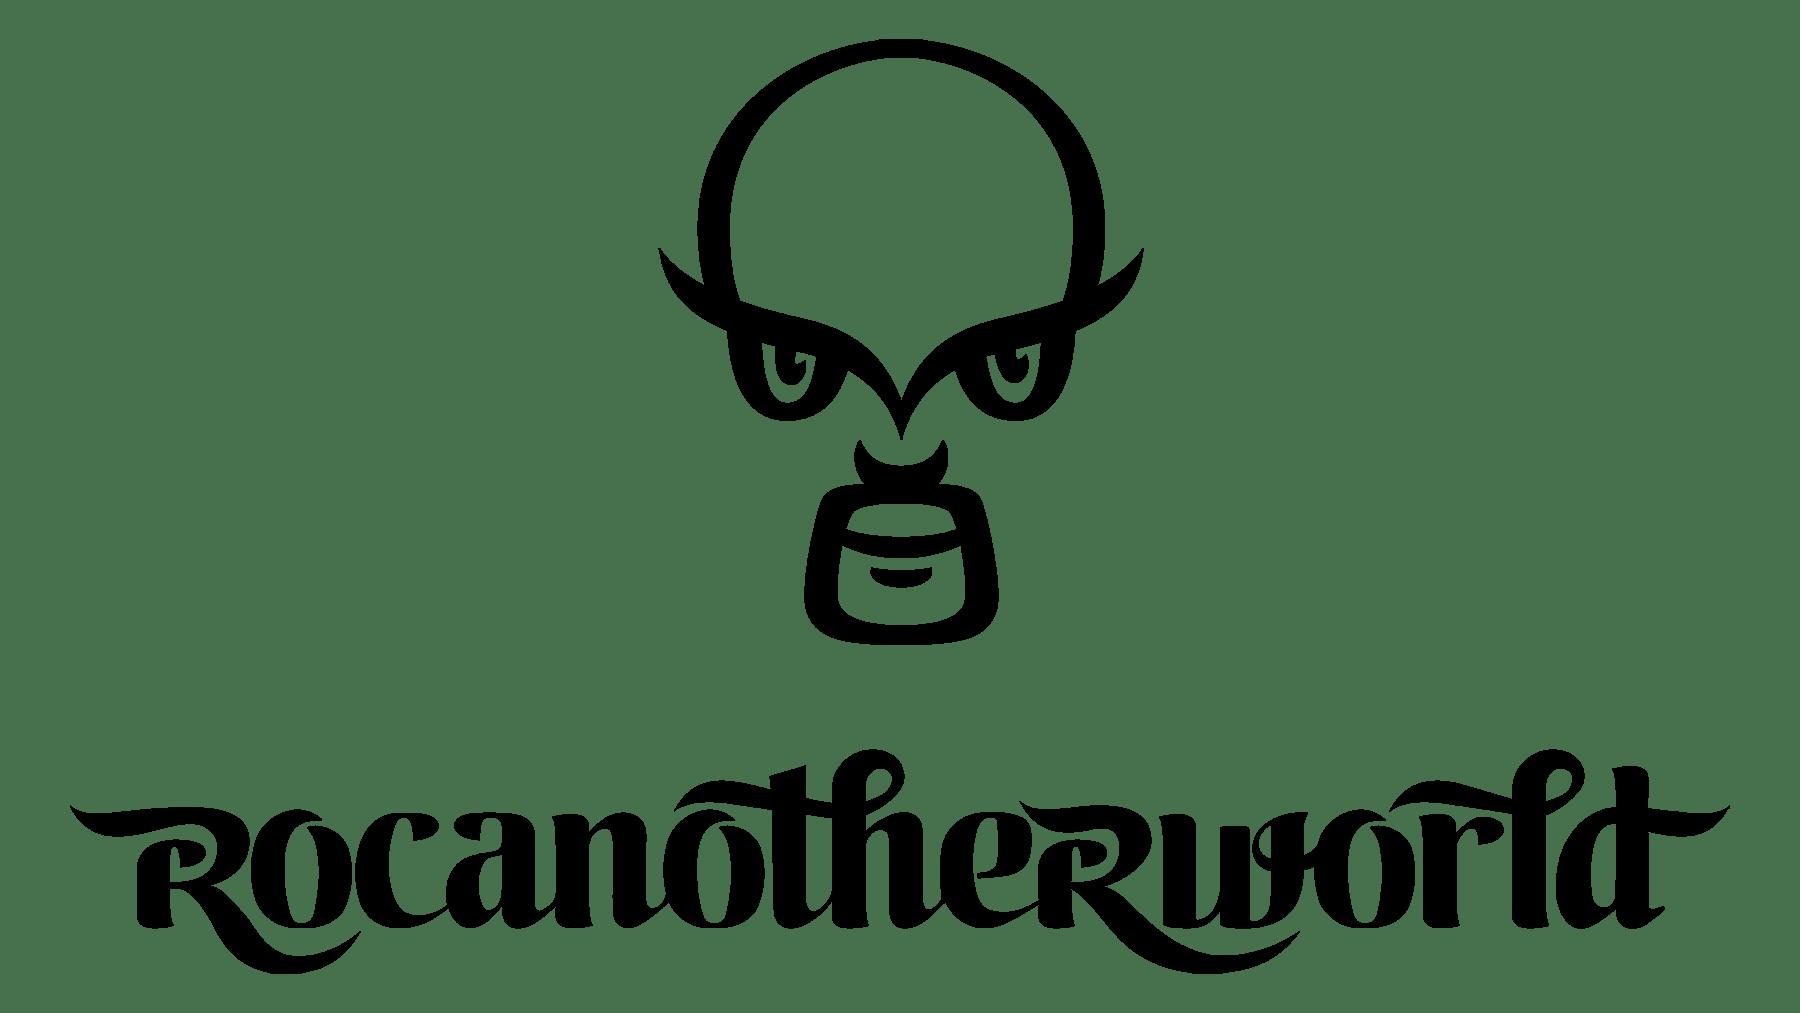 Rocanotherworld logo